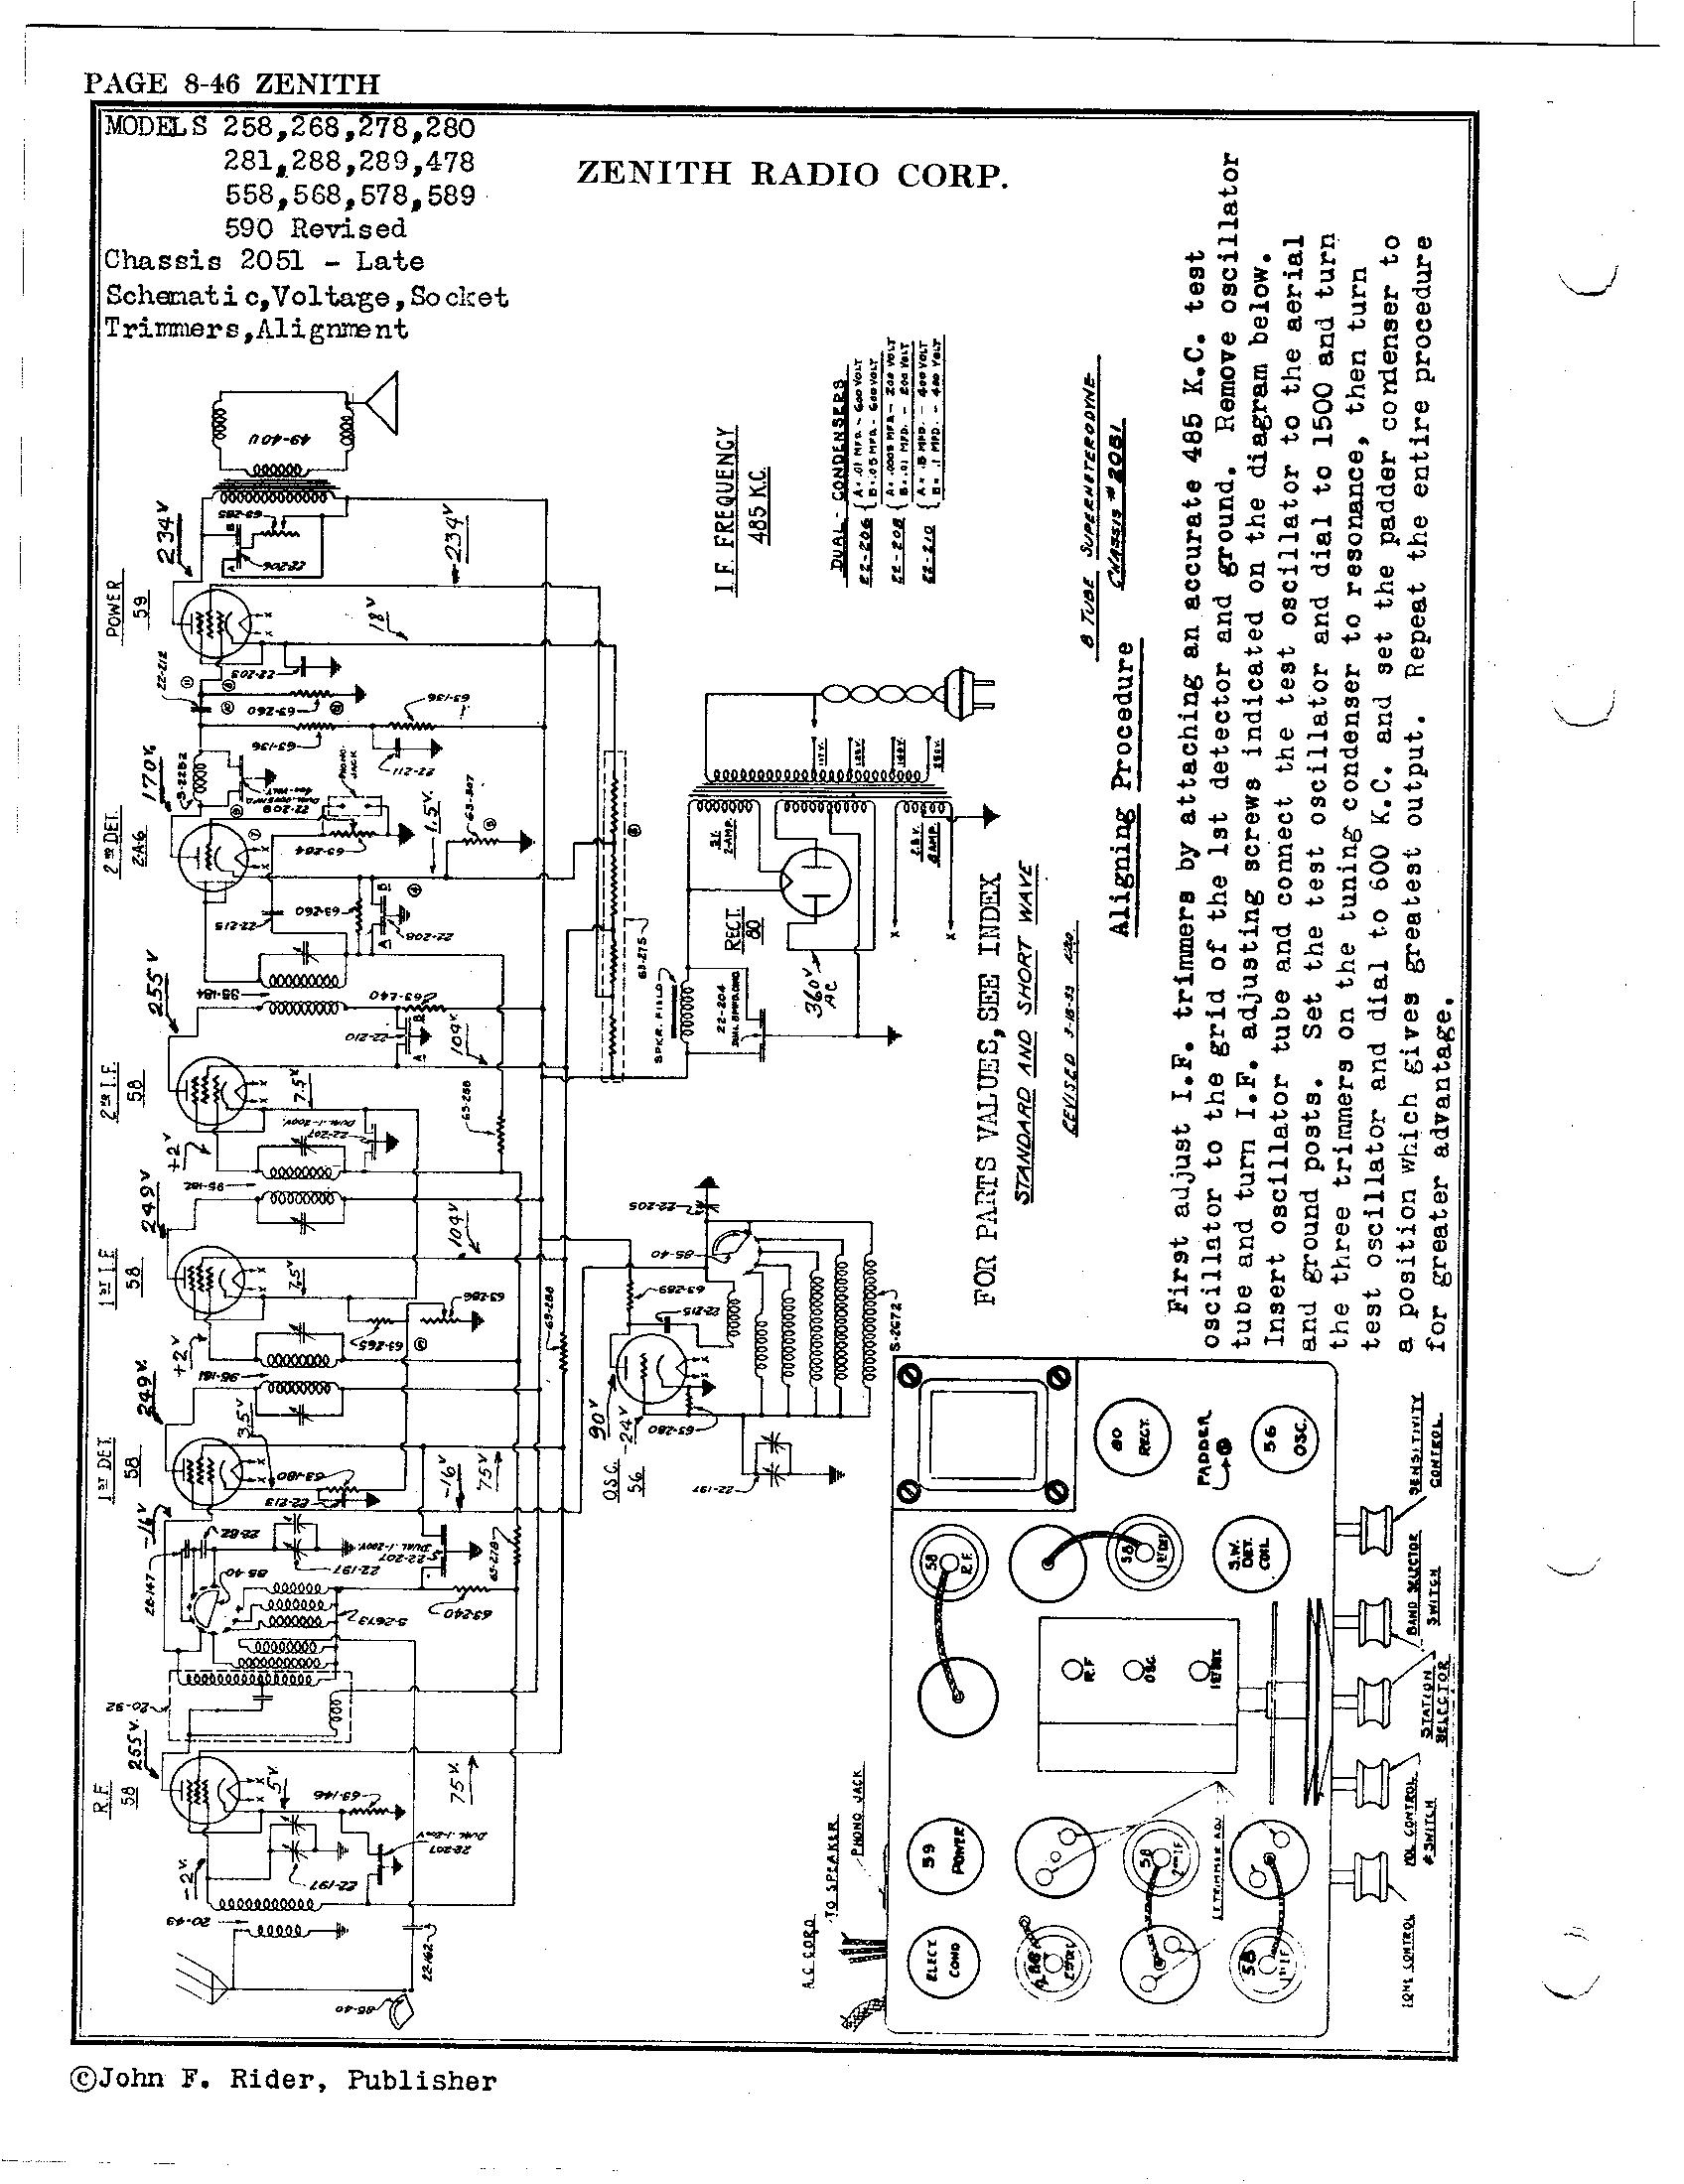 Zenith Radio Corp 268 Antique Electronic Supply